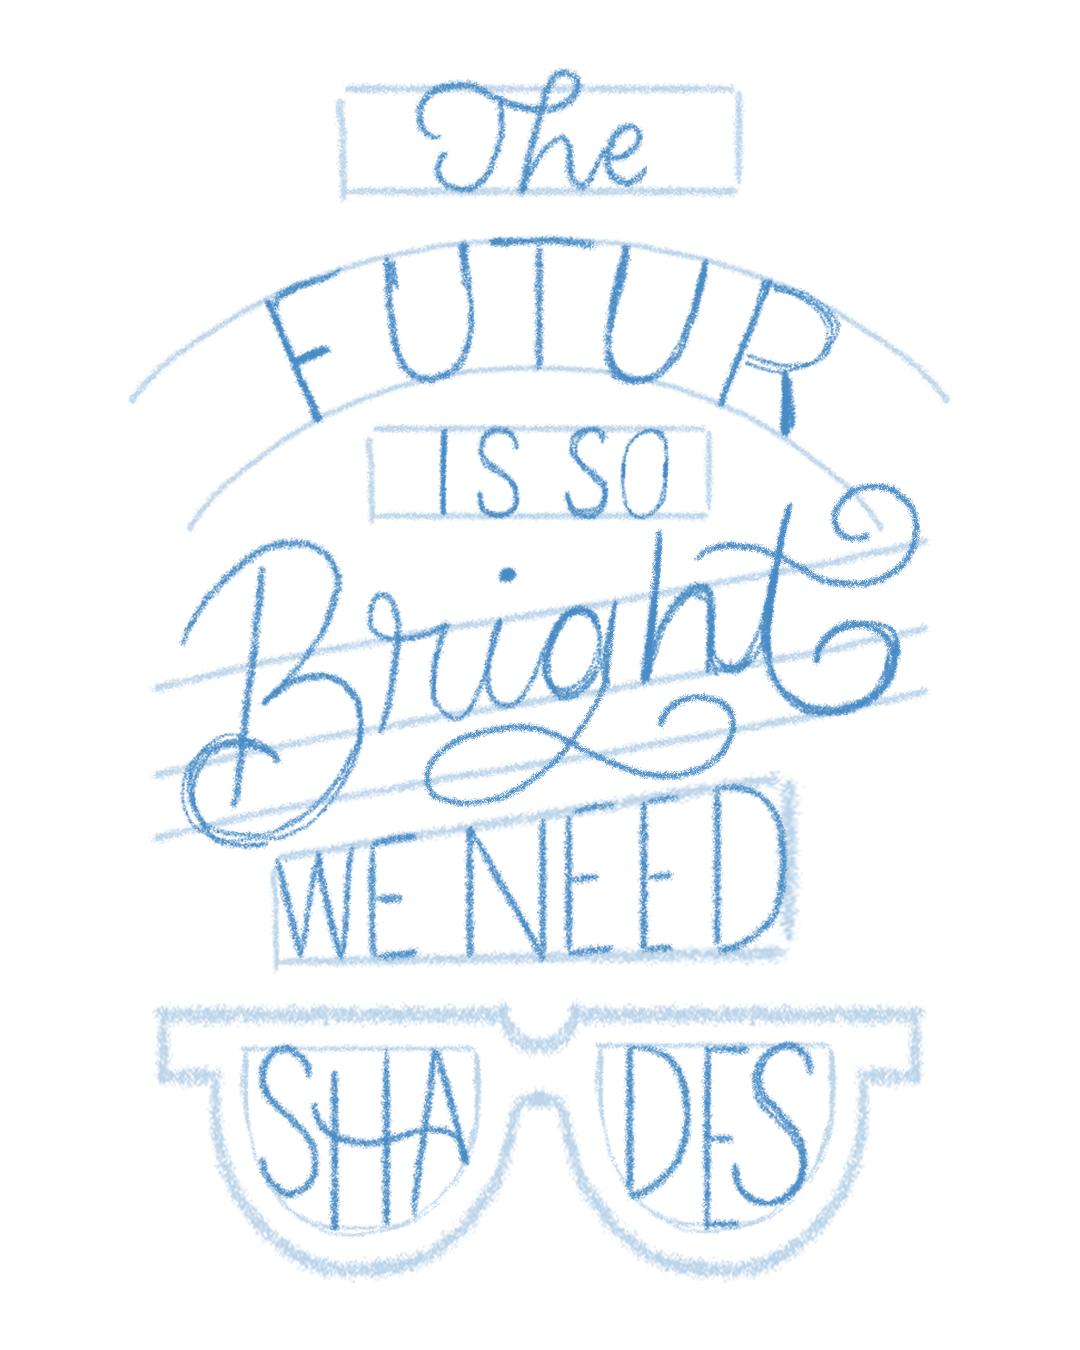 The Futur Skelton.png